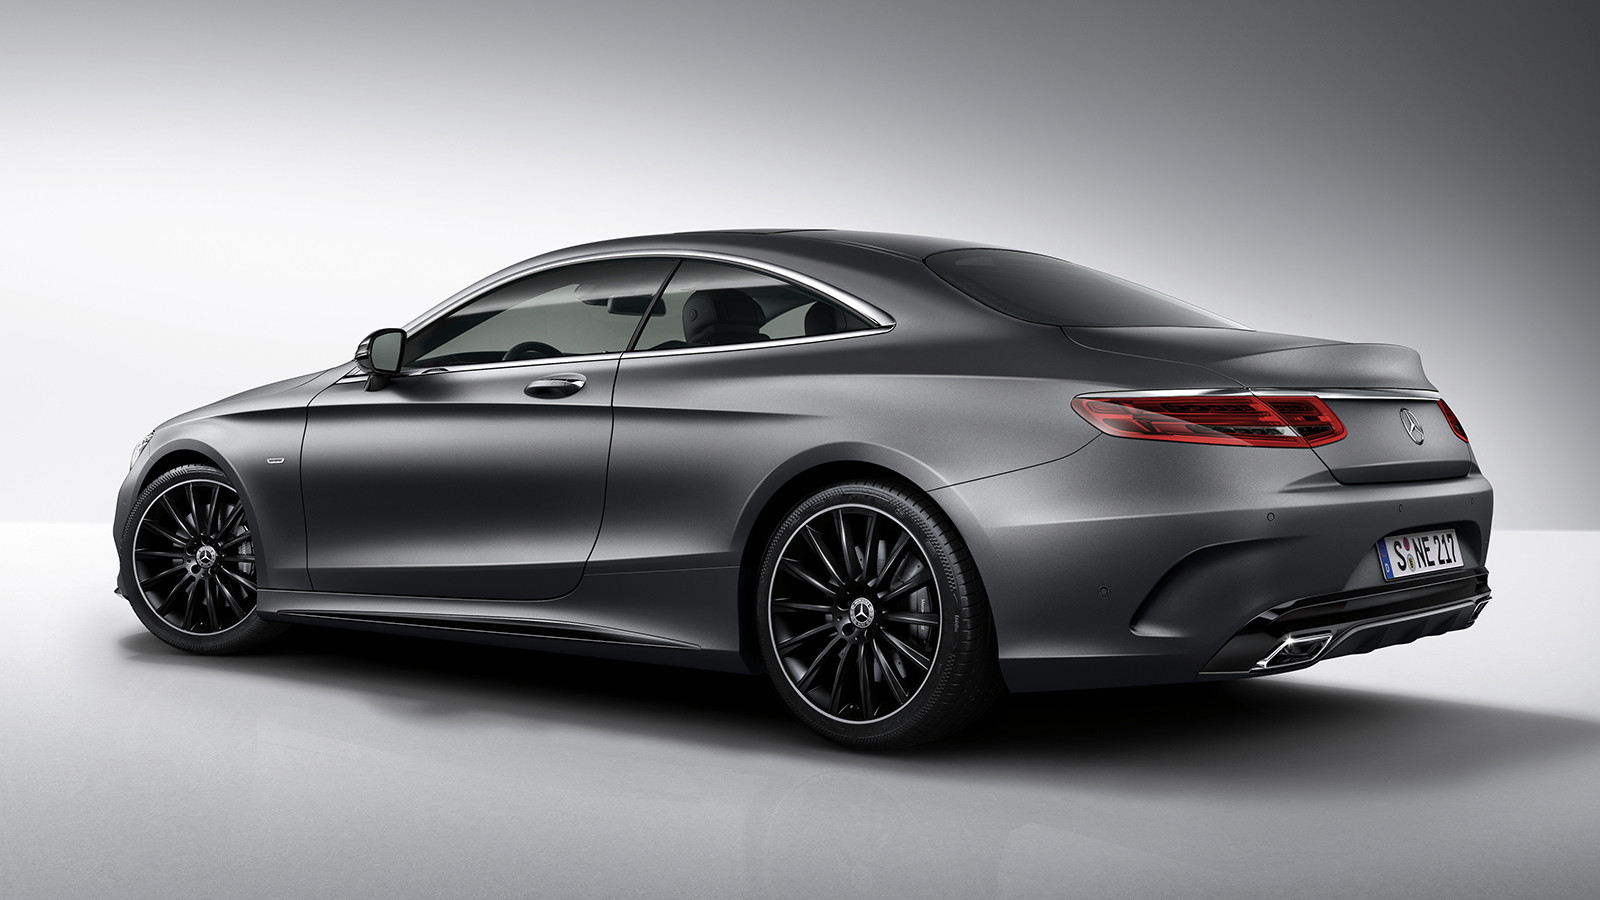 Benz S-Class Coupe Night Edition представлен официально